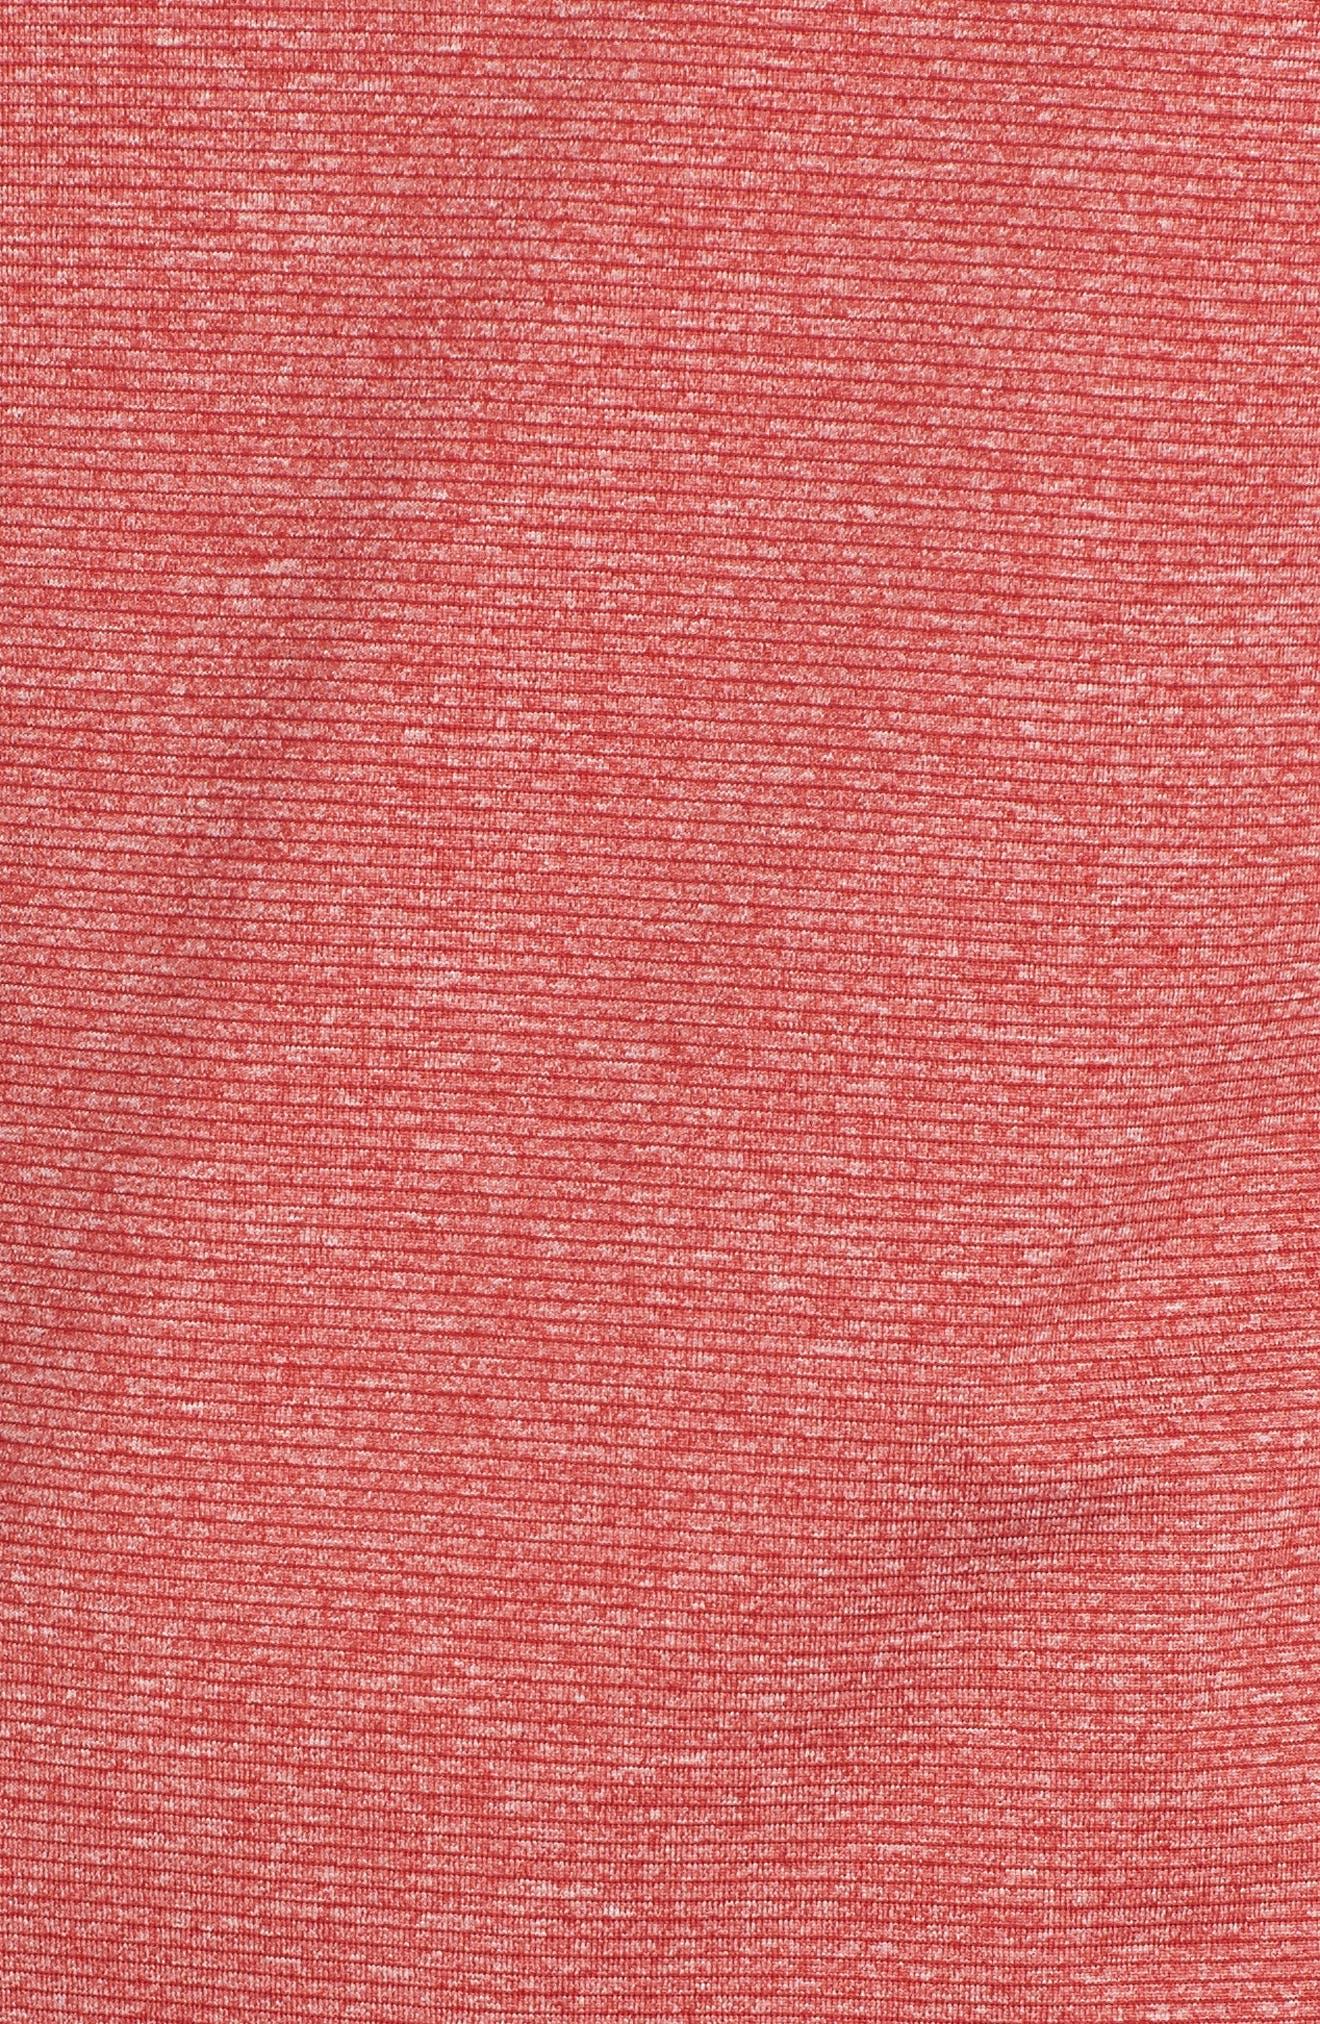 Shoreline - Kansas City Chiefs Half Zip Pullover,                             Alternate thumbnail 5, color,                             615